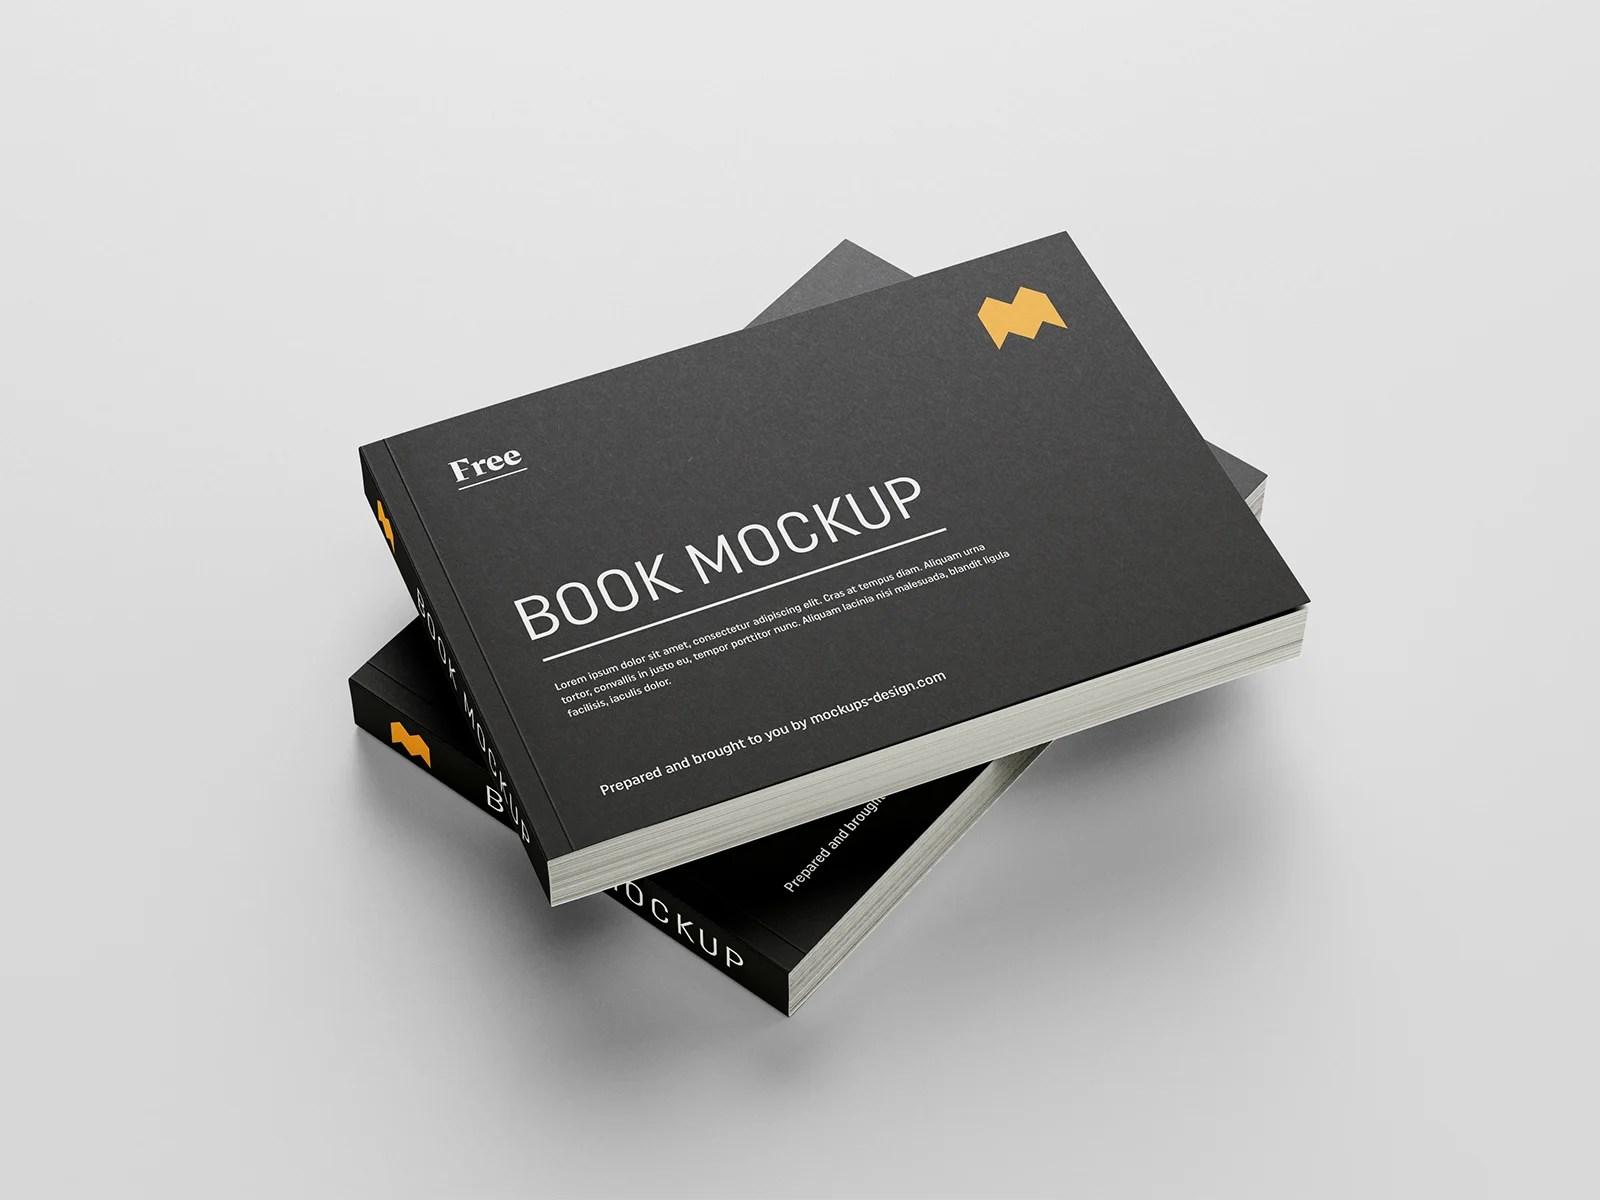 Free iphone 12 psd mockup to showcase your ios app presentation in a photorealistic style. Mockupworld Free Mockup